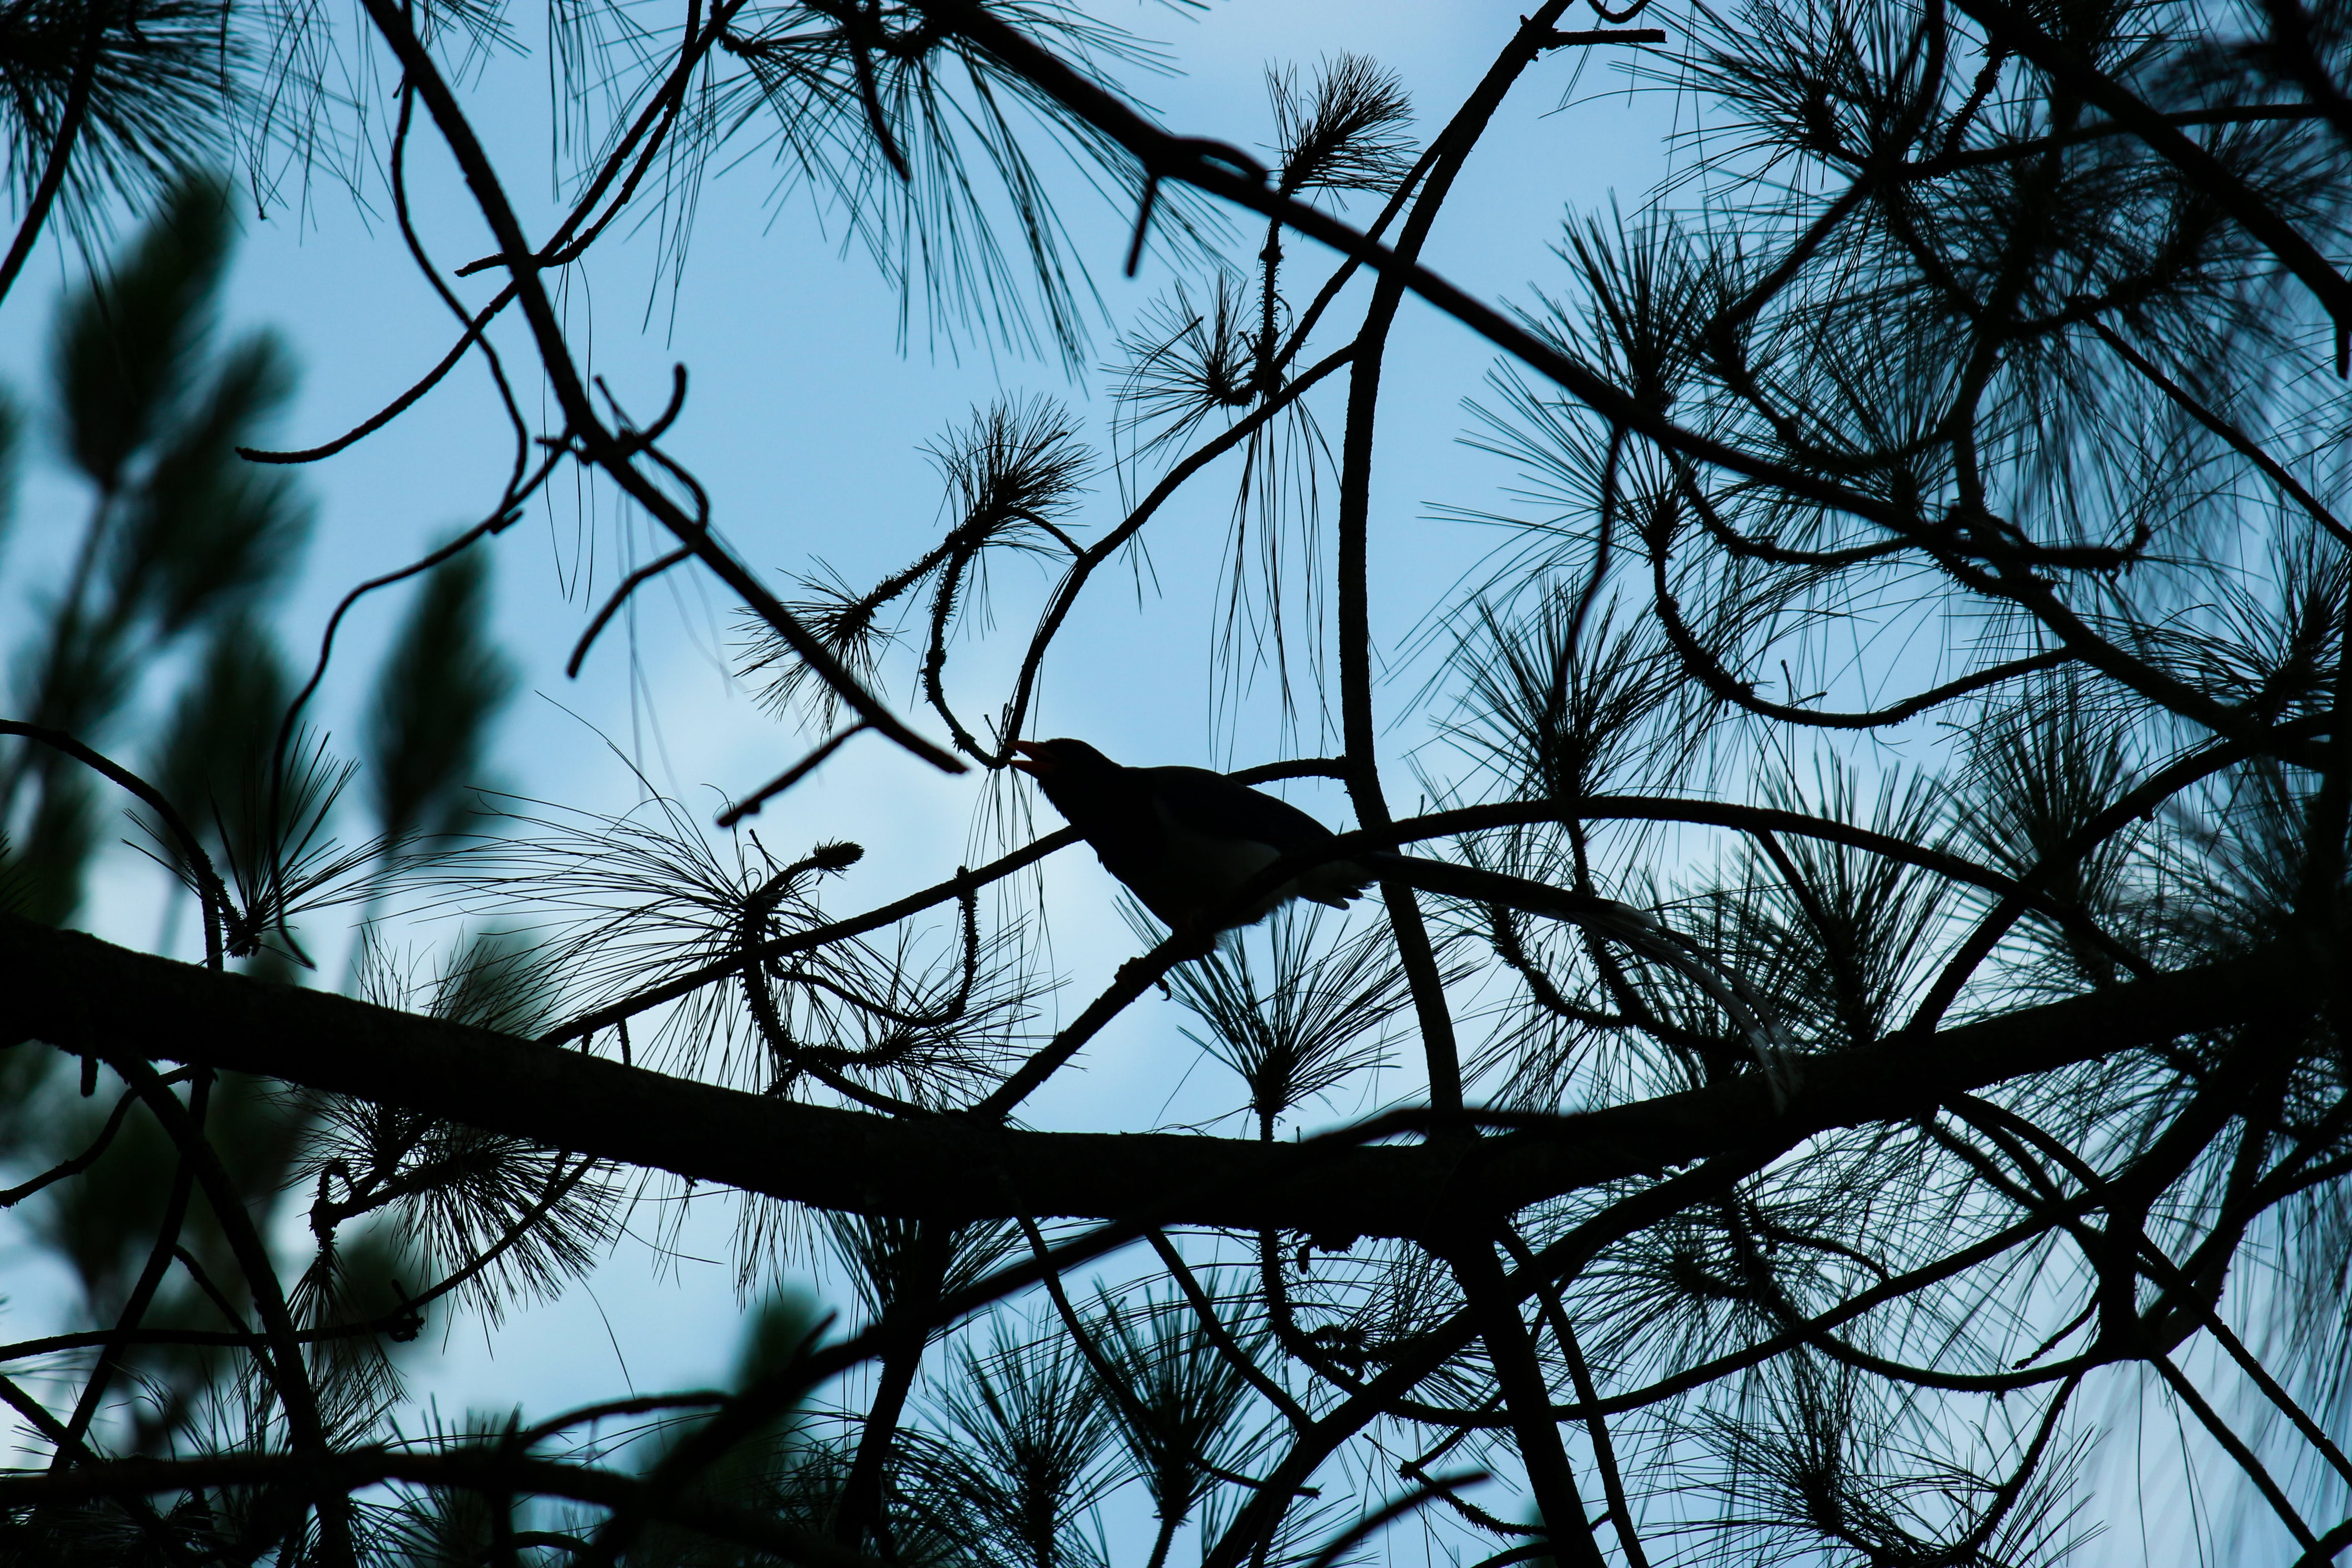 Gratis stockfoto met #birds #birdphotography #bird #nature #wildlife #b, #blues #bird #wildlife #trees #pine #nature